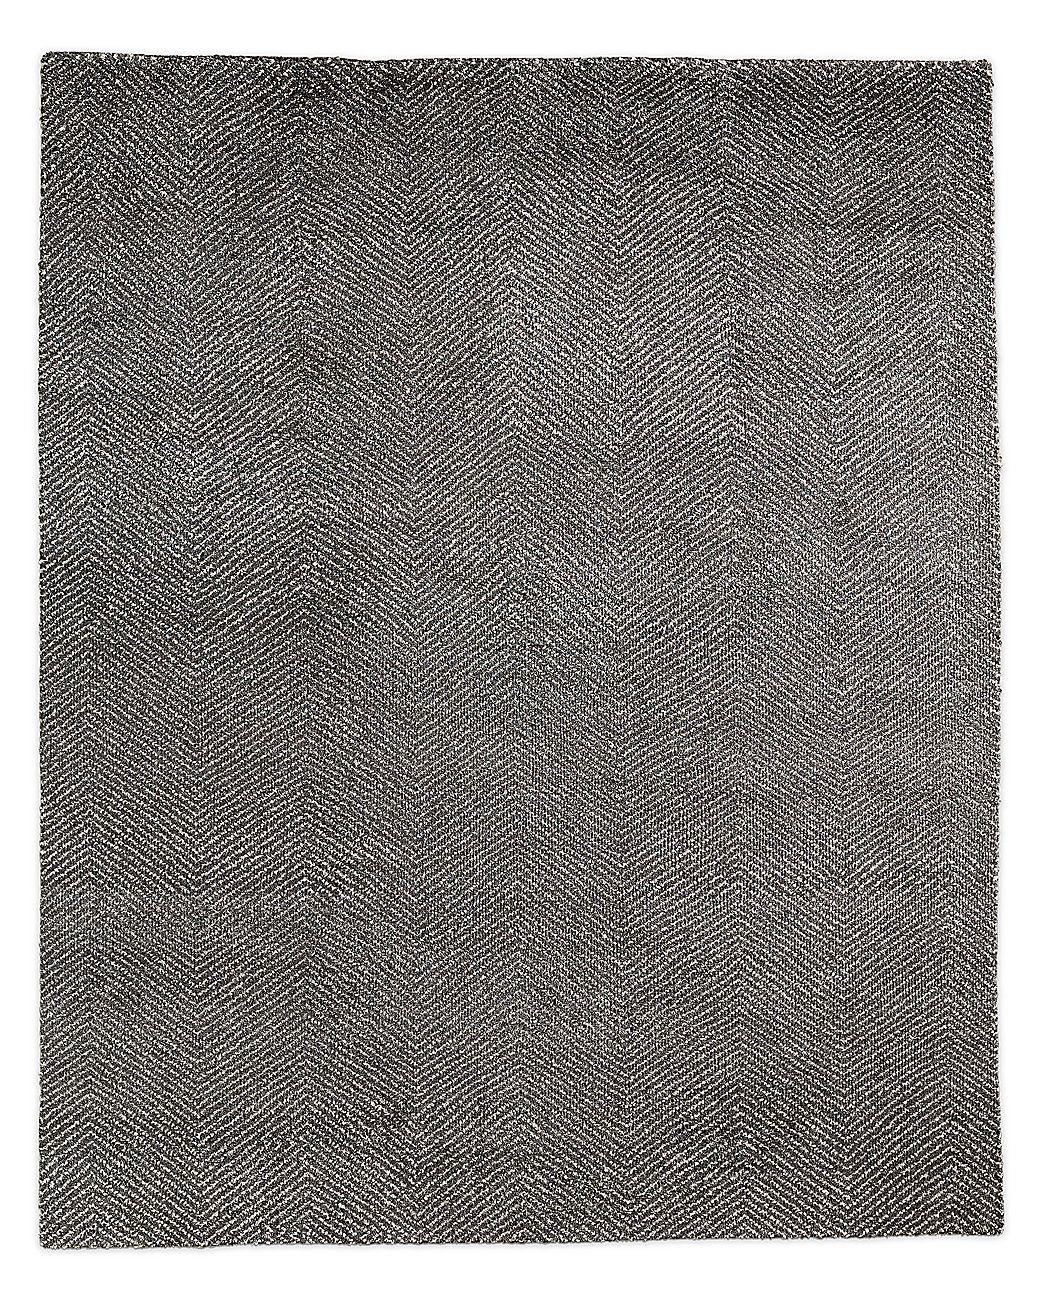 Mazo Rug - Black/Grey